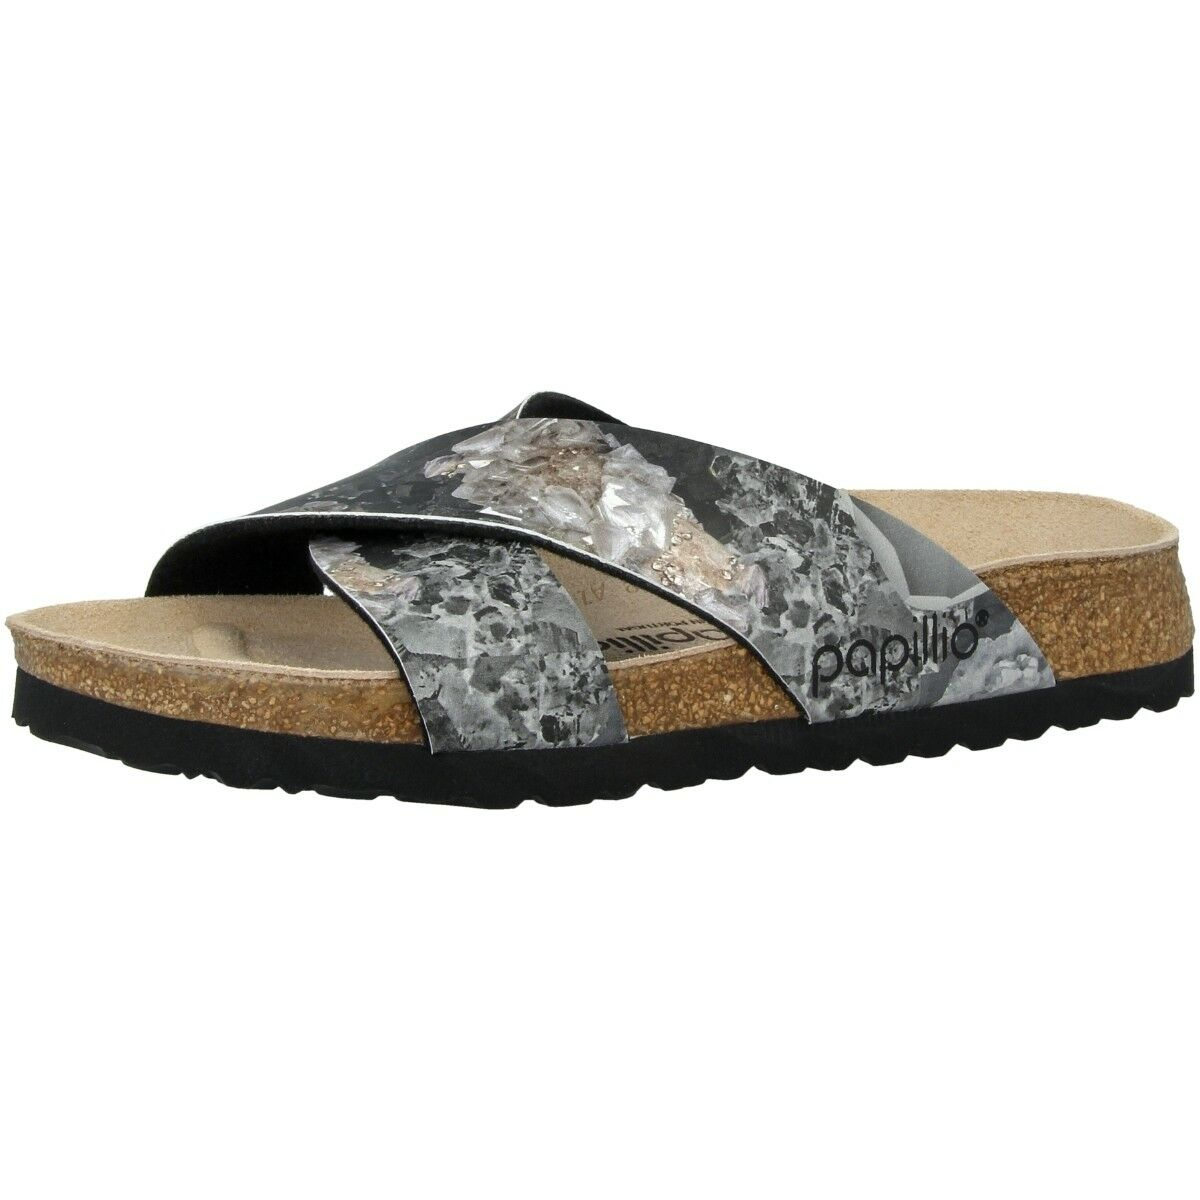 Birkenstock Papillio Daytona Birko-flor zapatos ancho sandalia es estrecho 1009094